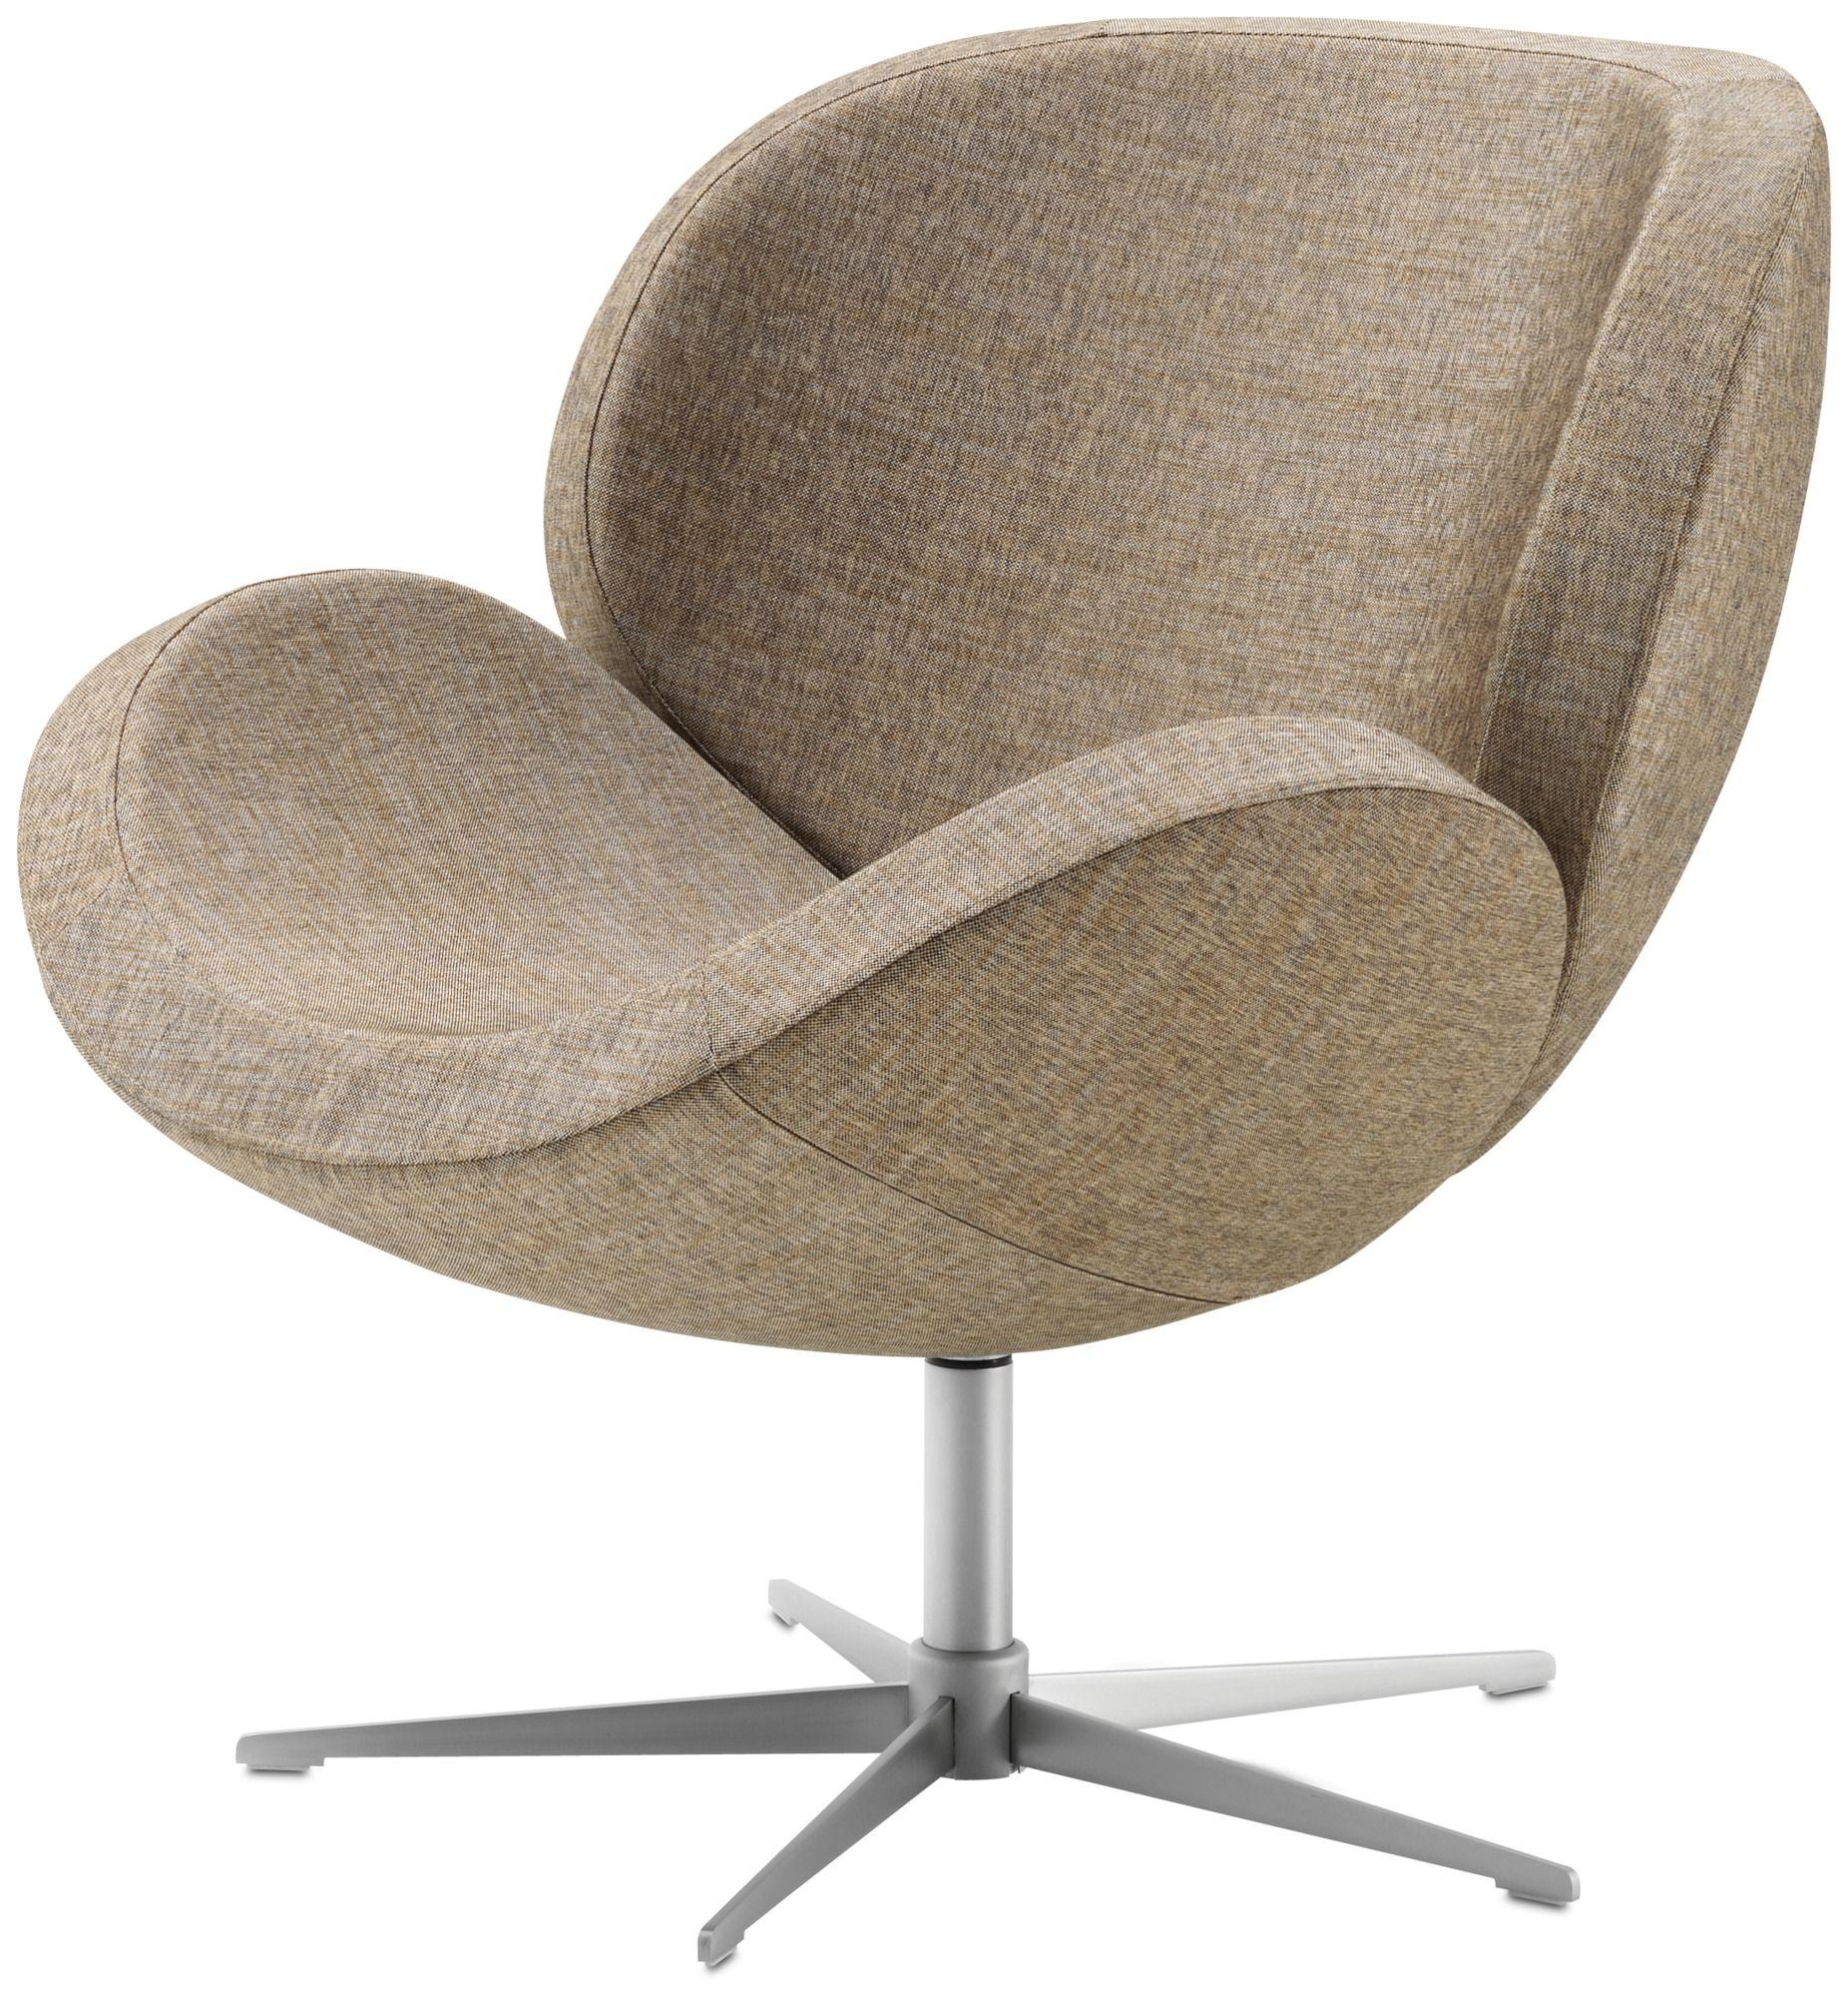 Modern Designer Armchairs Leather Lounge Chairs Boconcept Furniture Sydney Australia Contemporary Armchair Modern Armchair Armchair